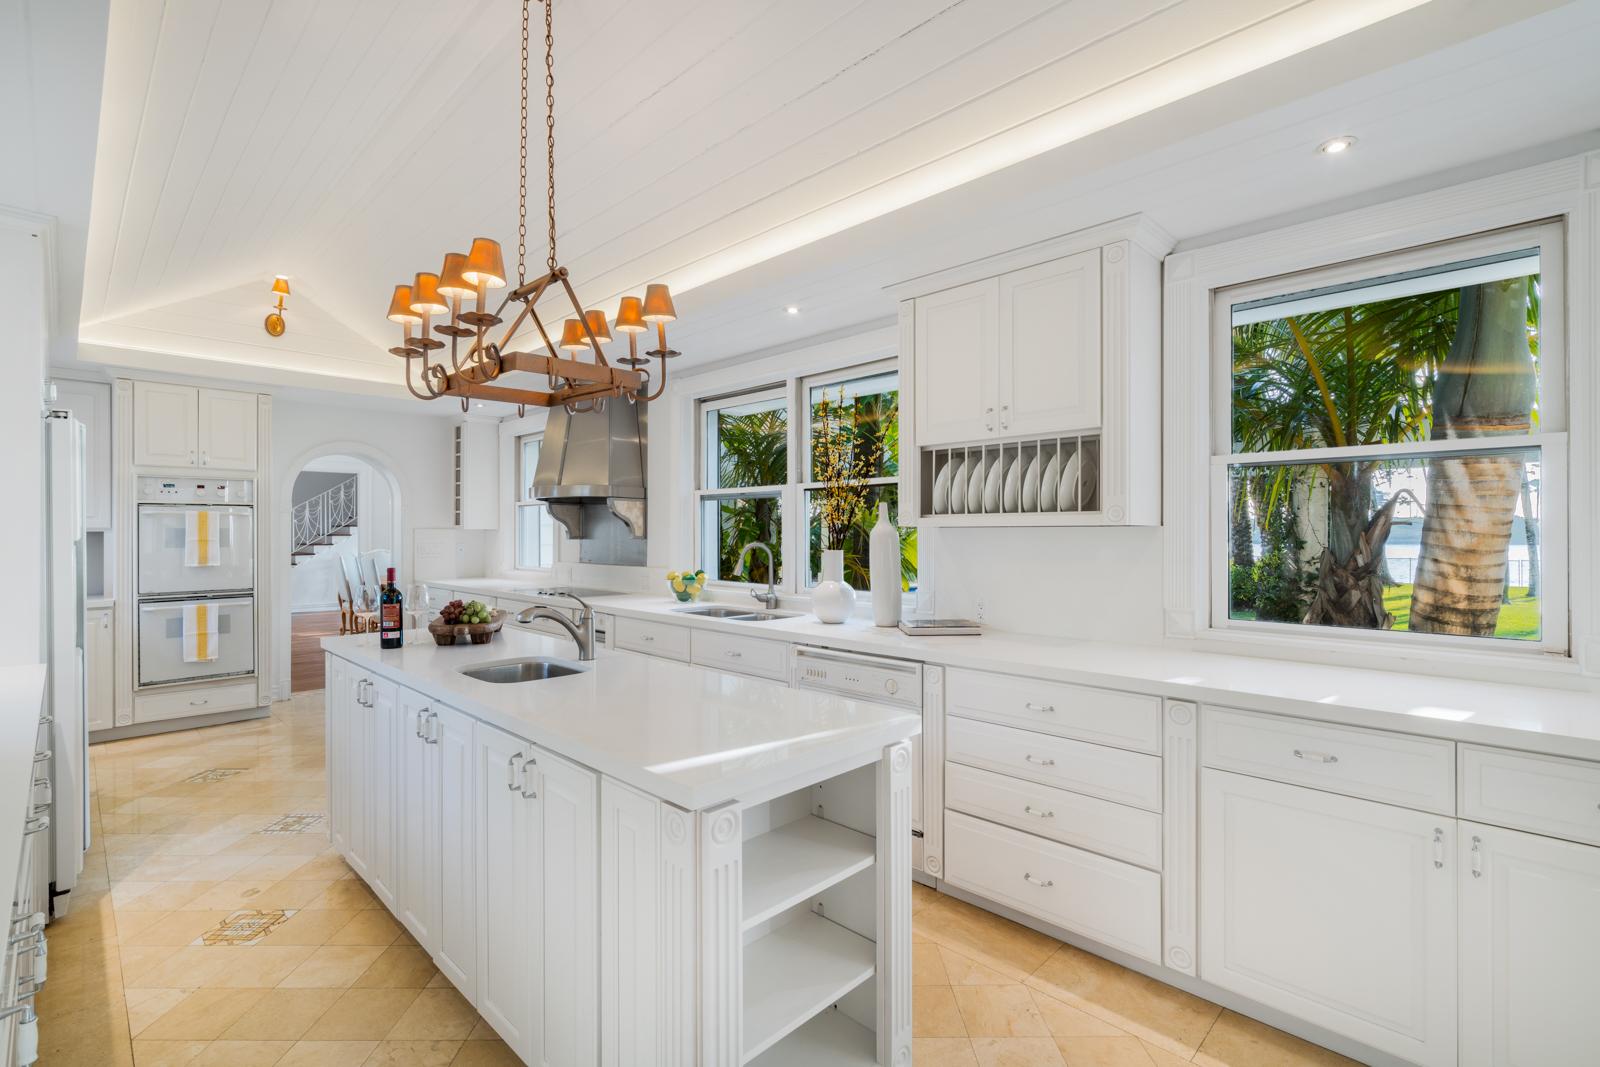 Emilio & Gloria Estefan List The Carlos Ott-Designed 1 Star Island Drive For $32 Million